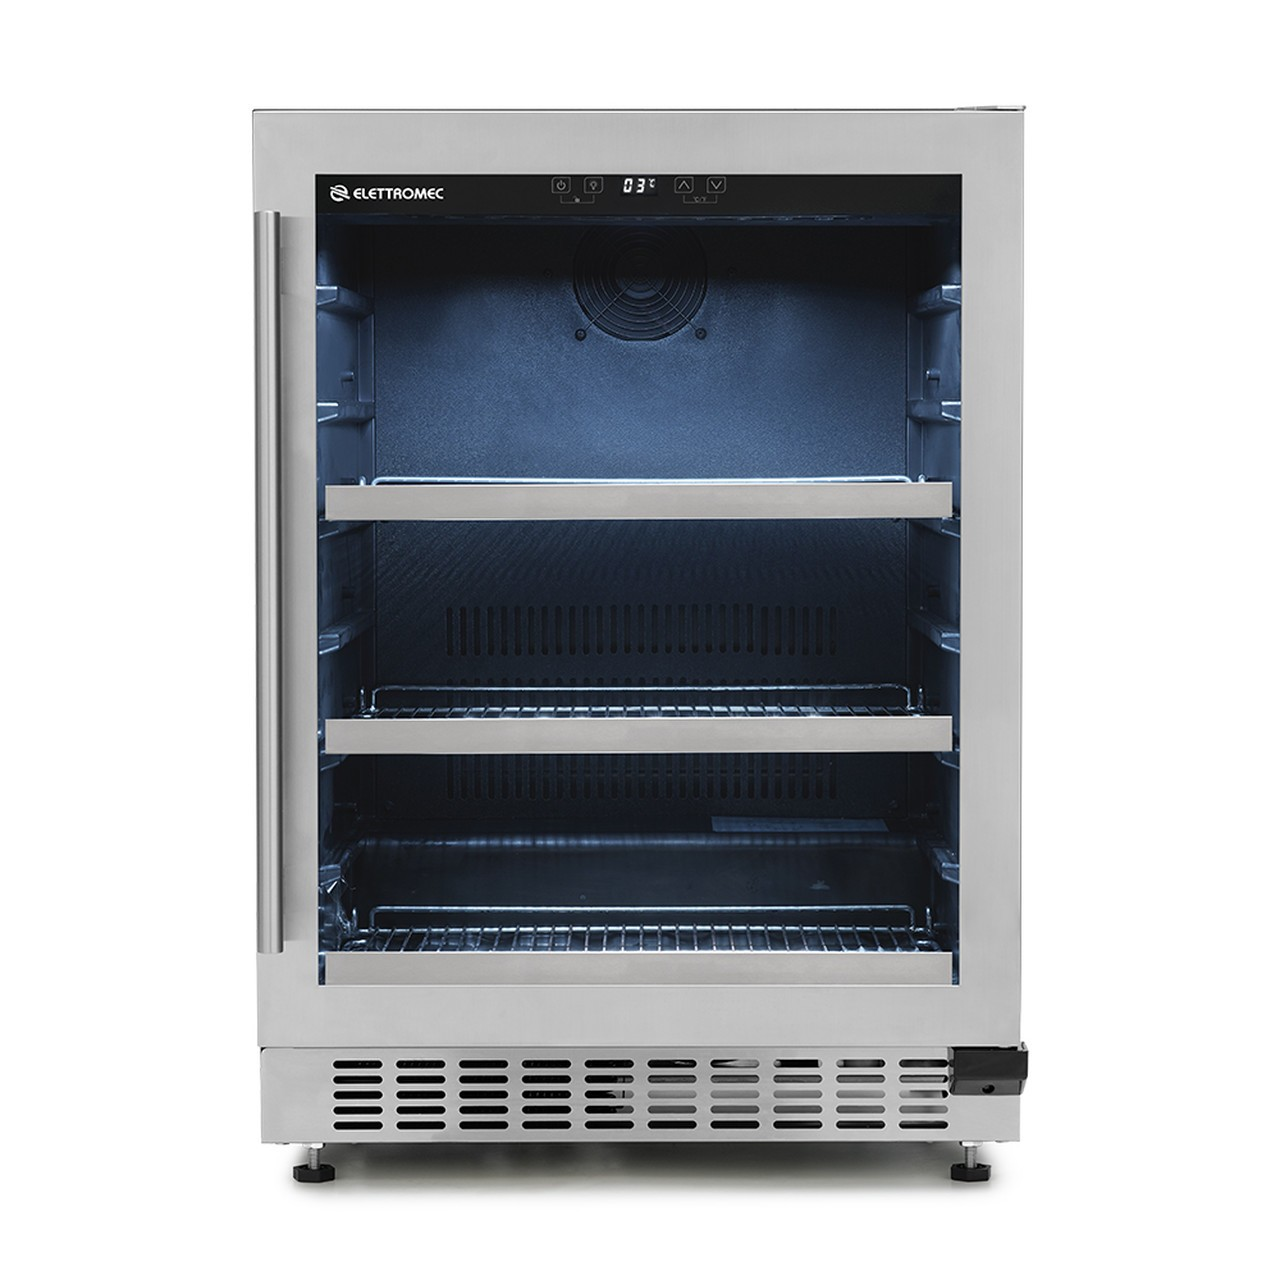 Frigobar Elettromec de Embutir 135 Litros Inox 127V